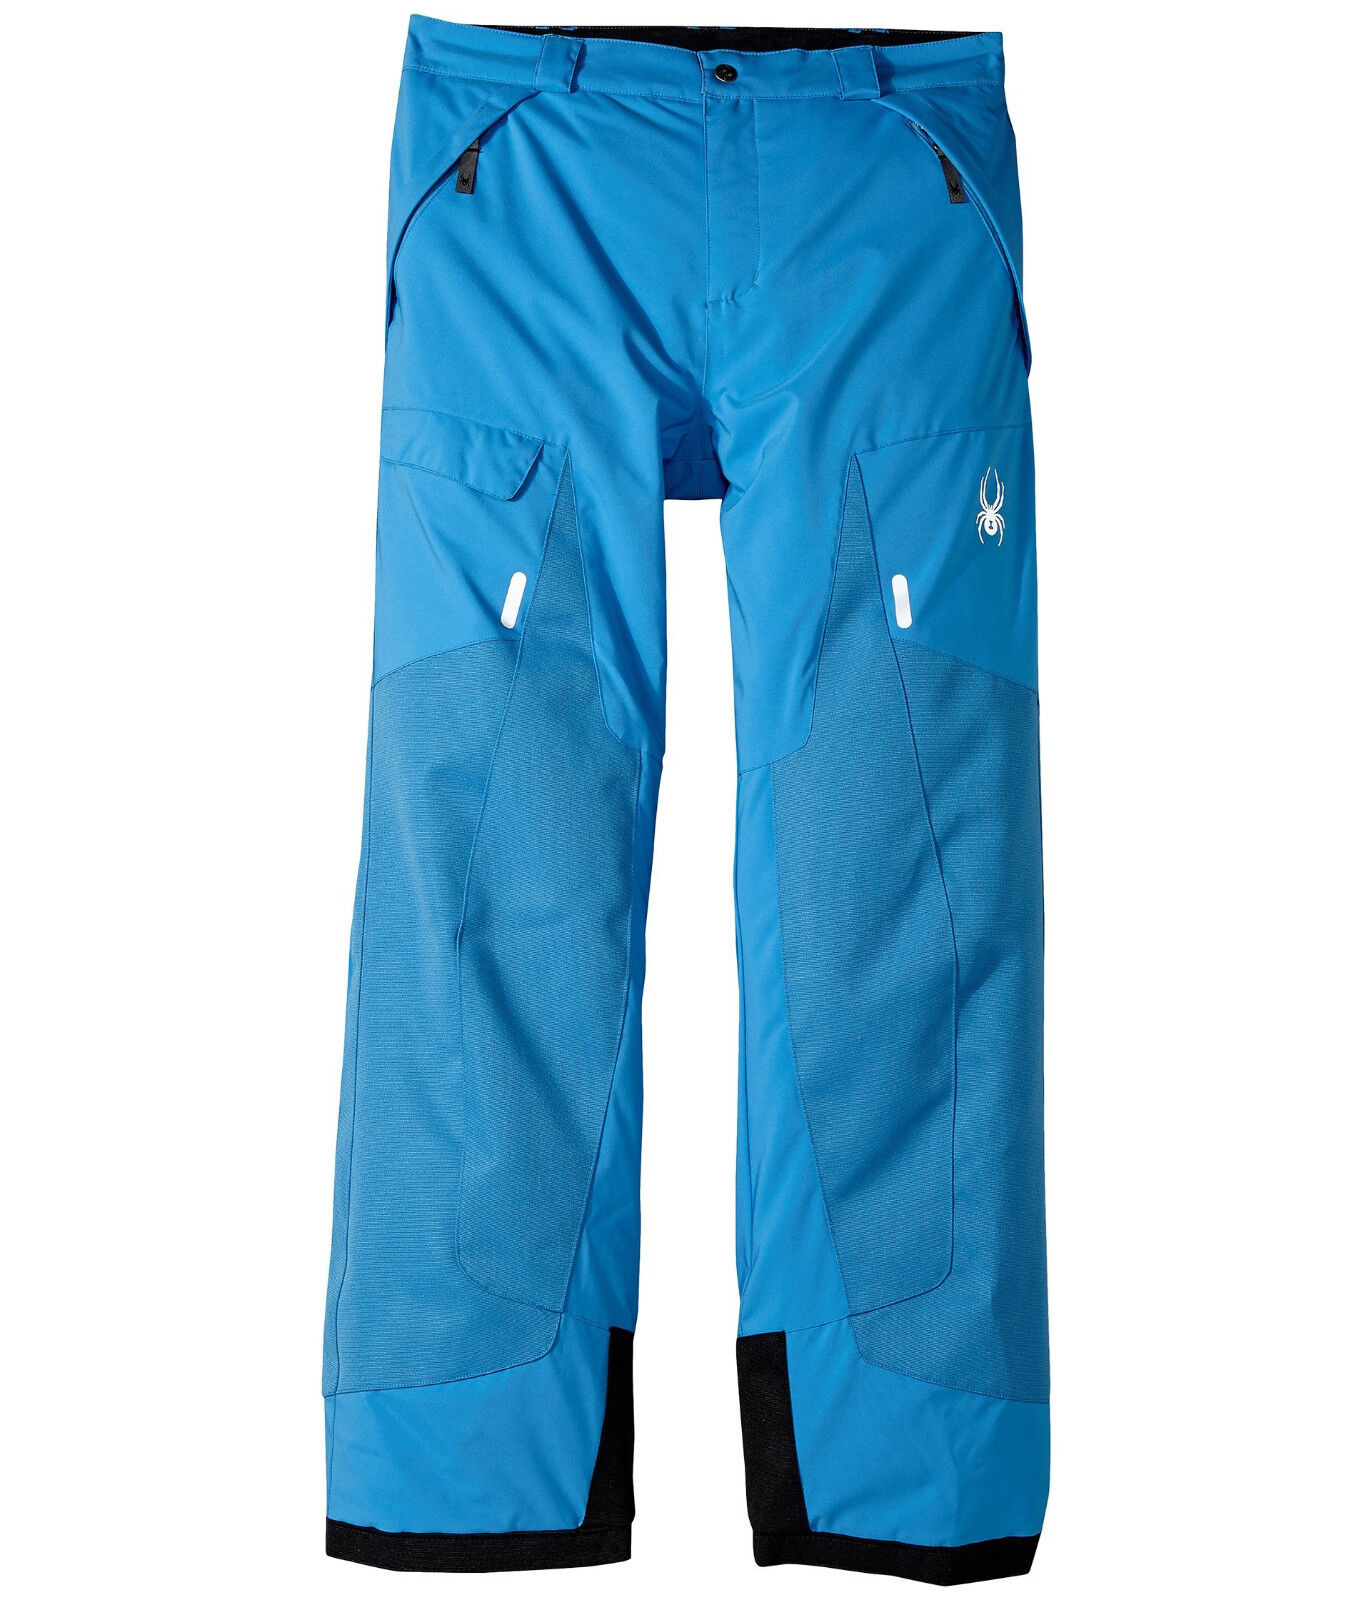 Spyder Boys Action Pants, Ski Snowboarding Pants, Size 8 Boys, NWT